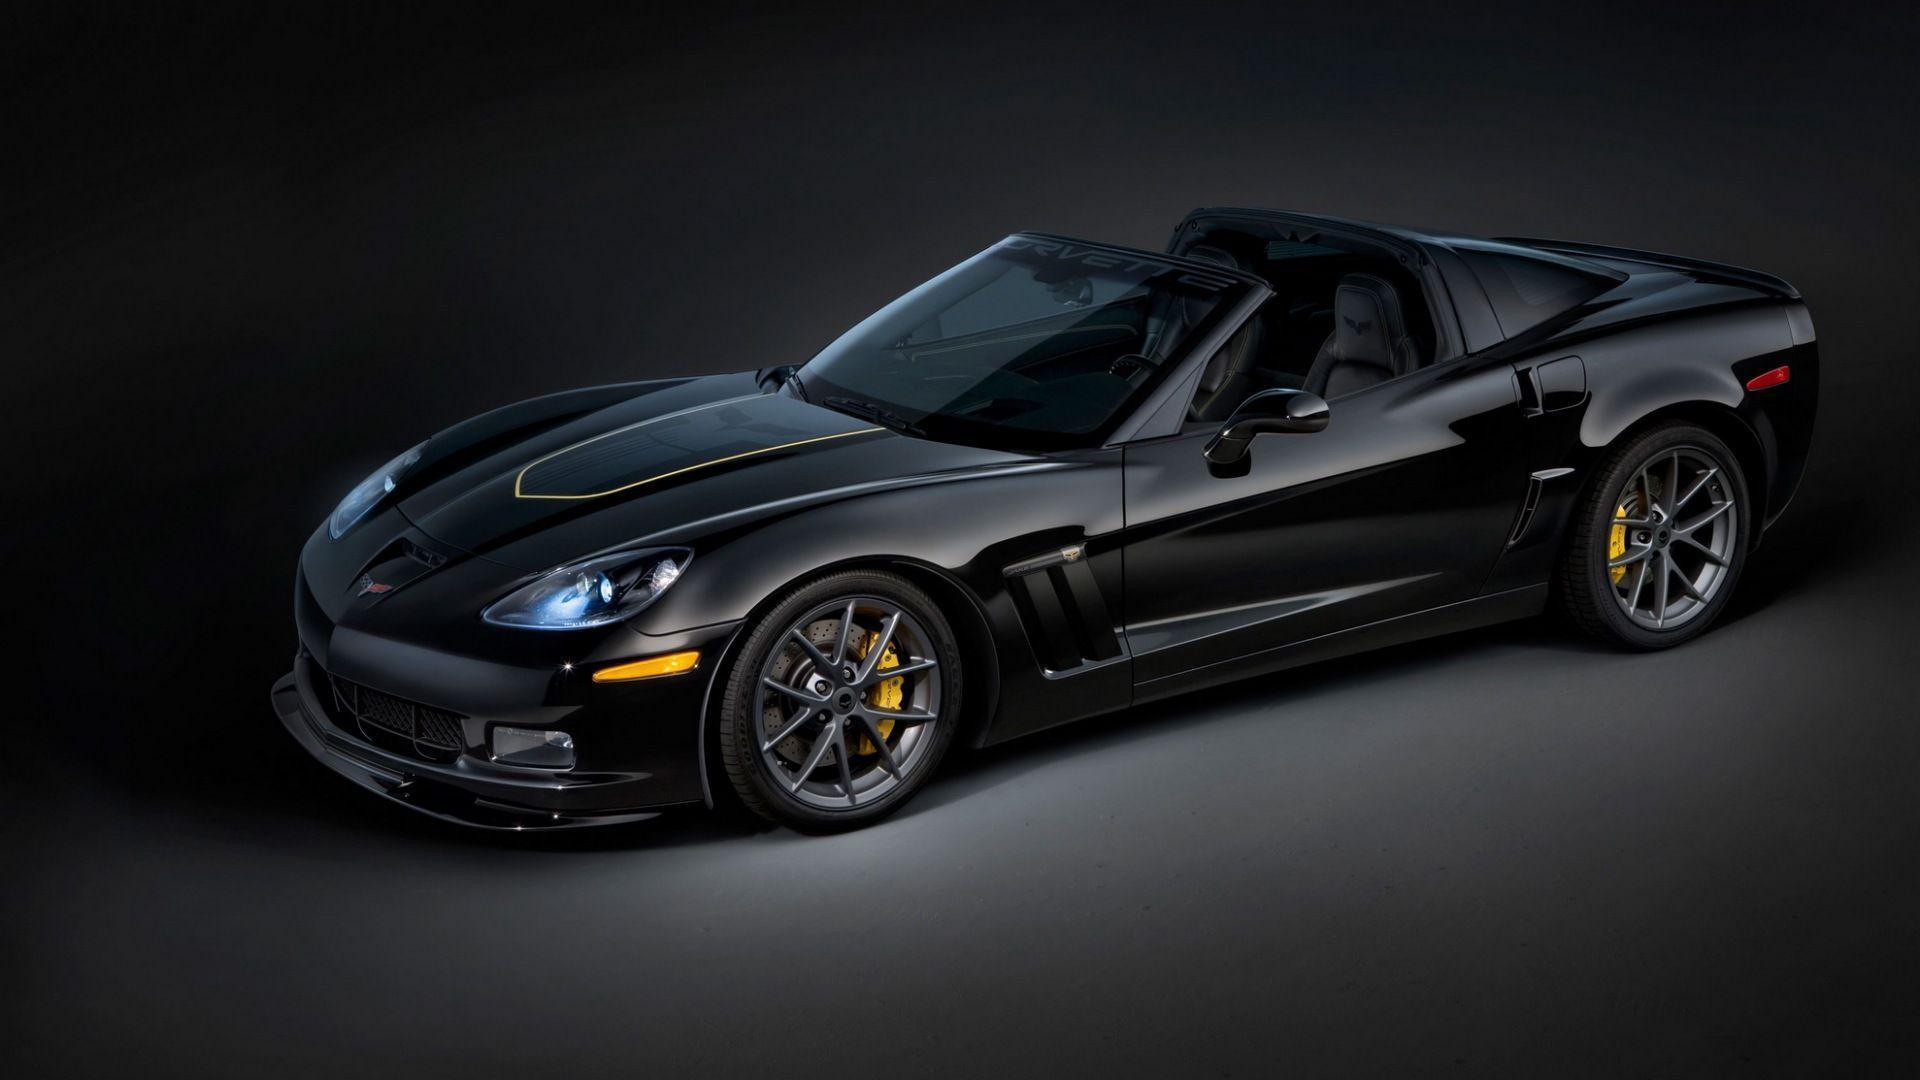 black corvette zr1 wallpapers - photo #1